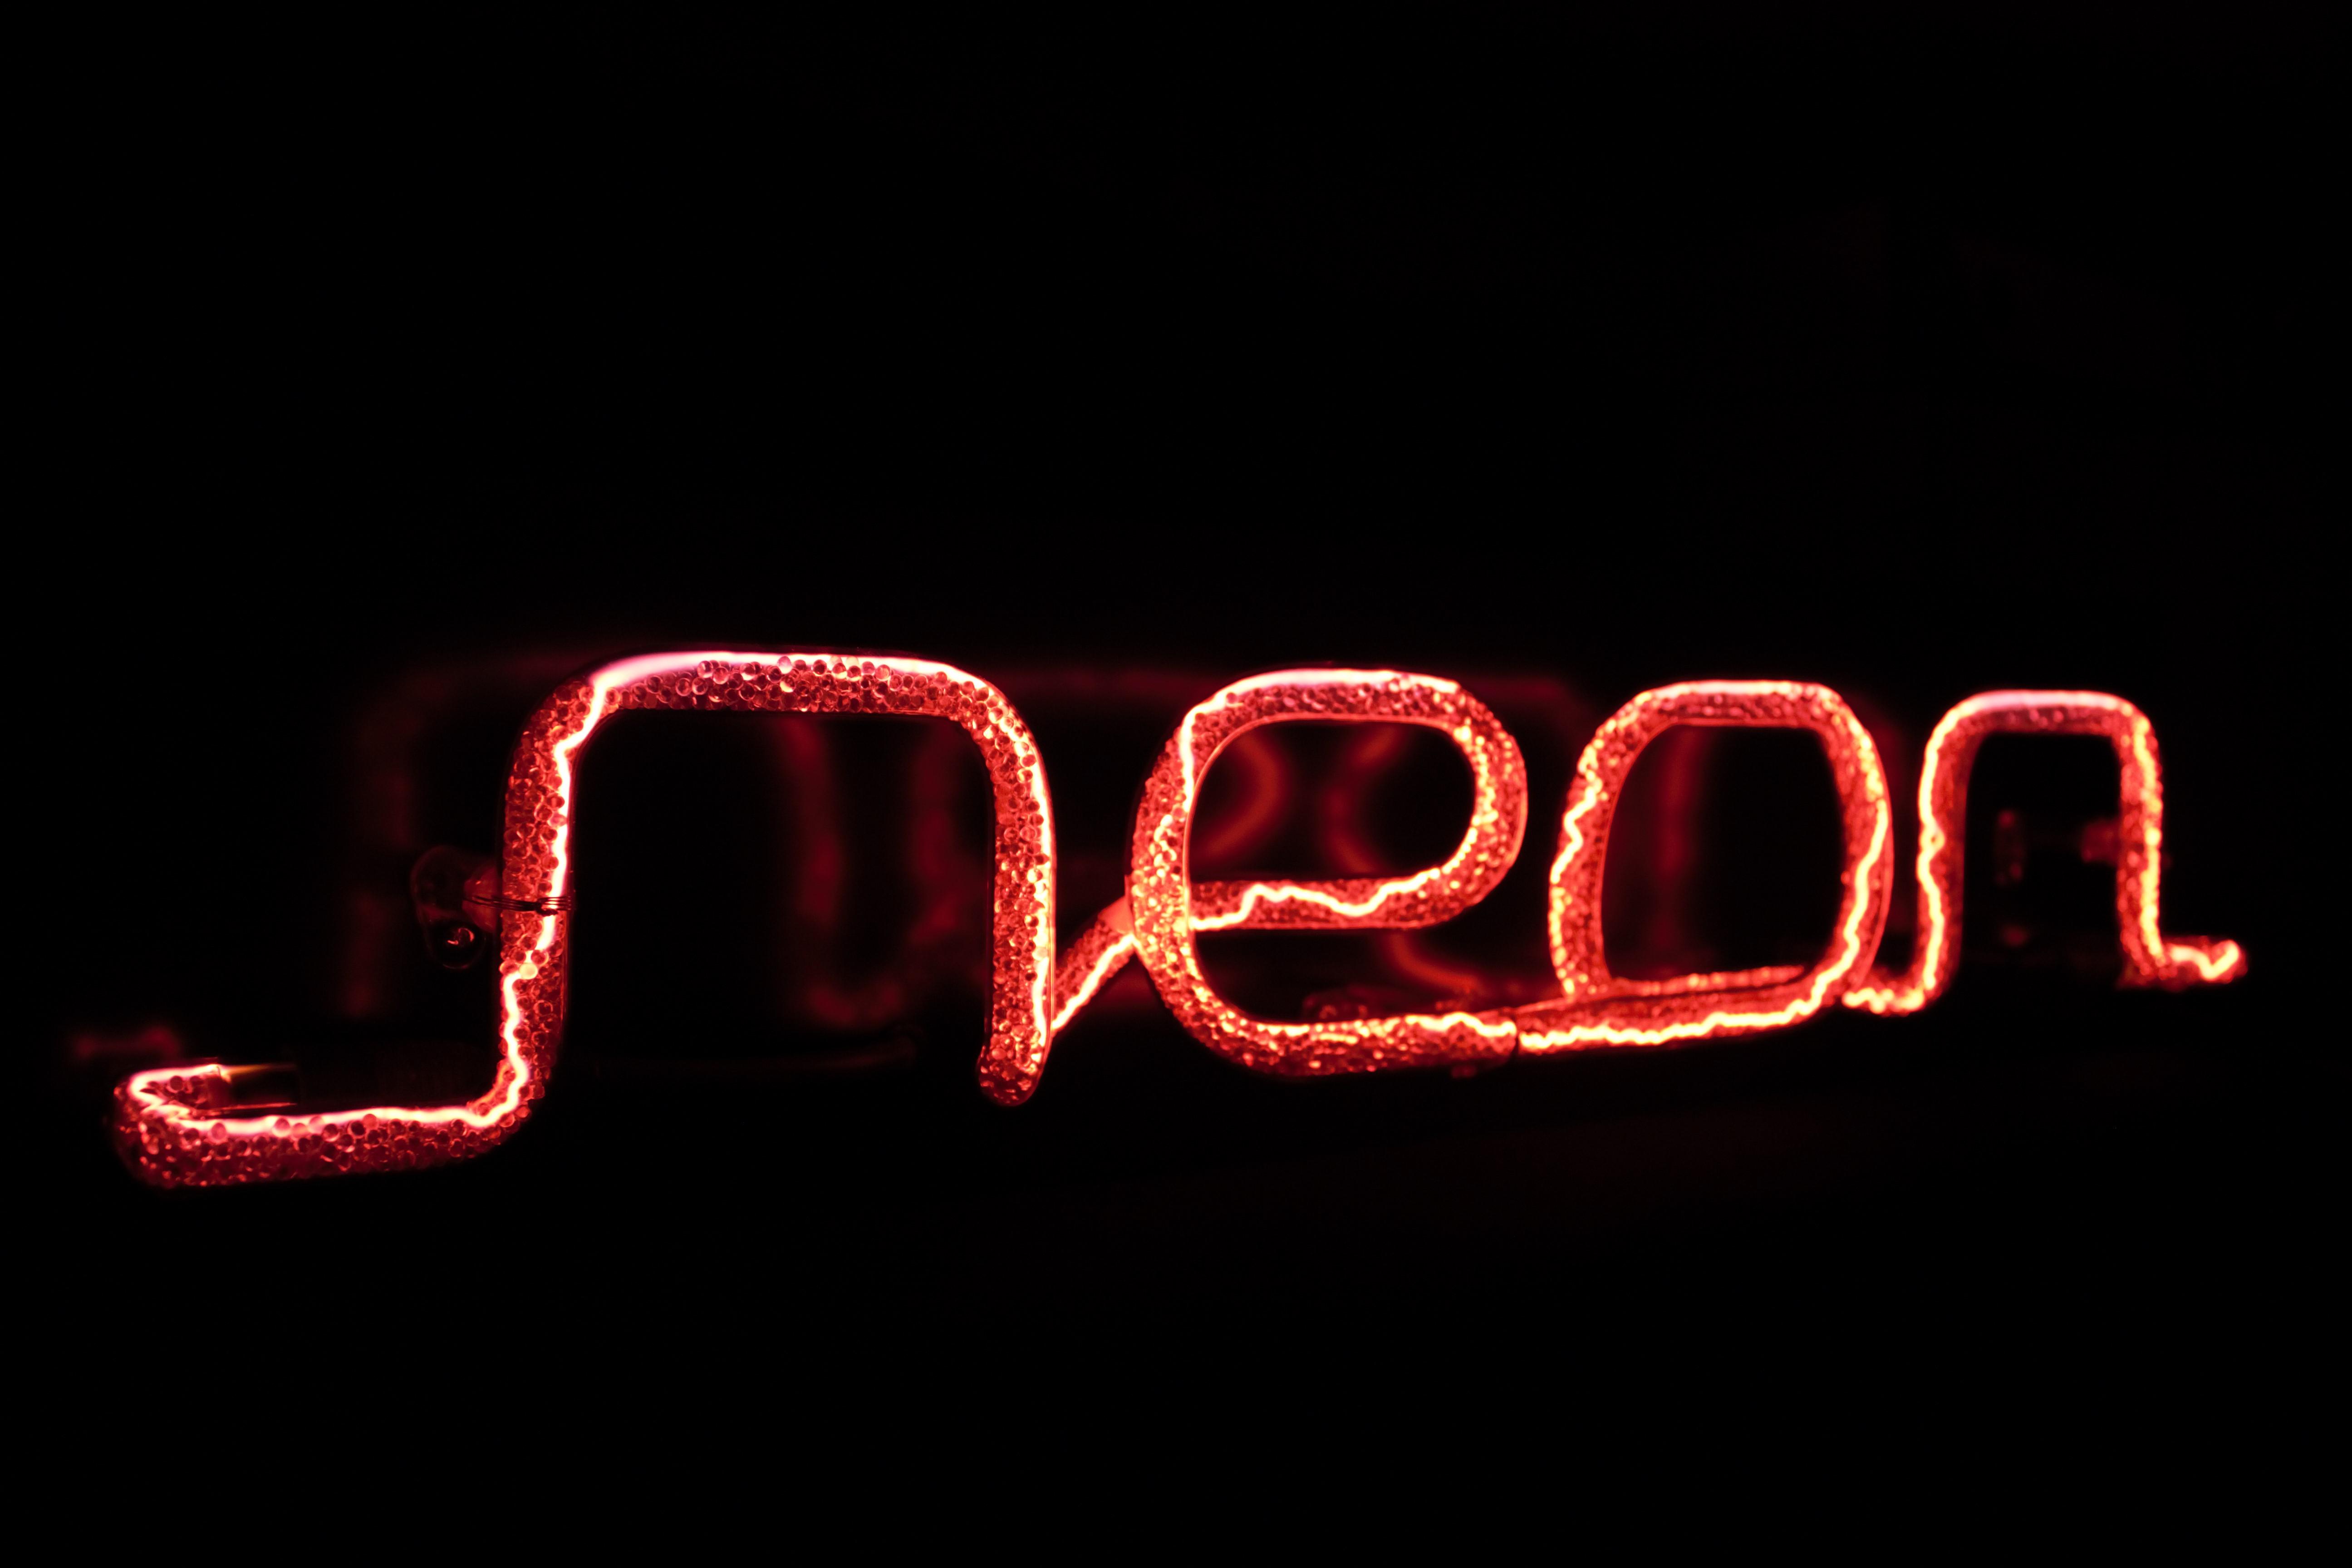 Neon deco lettrage